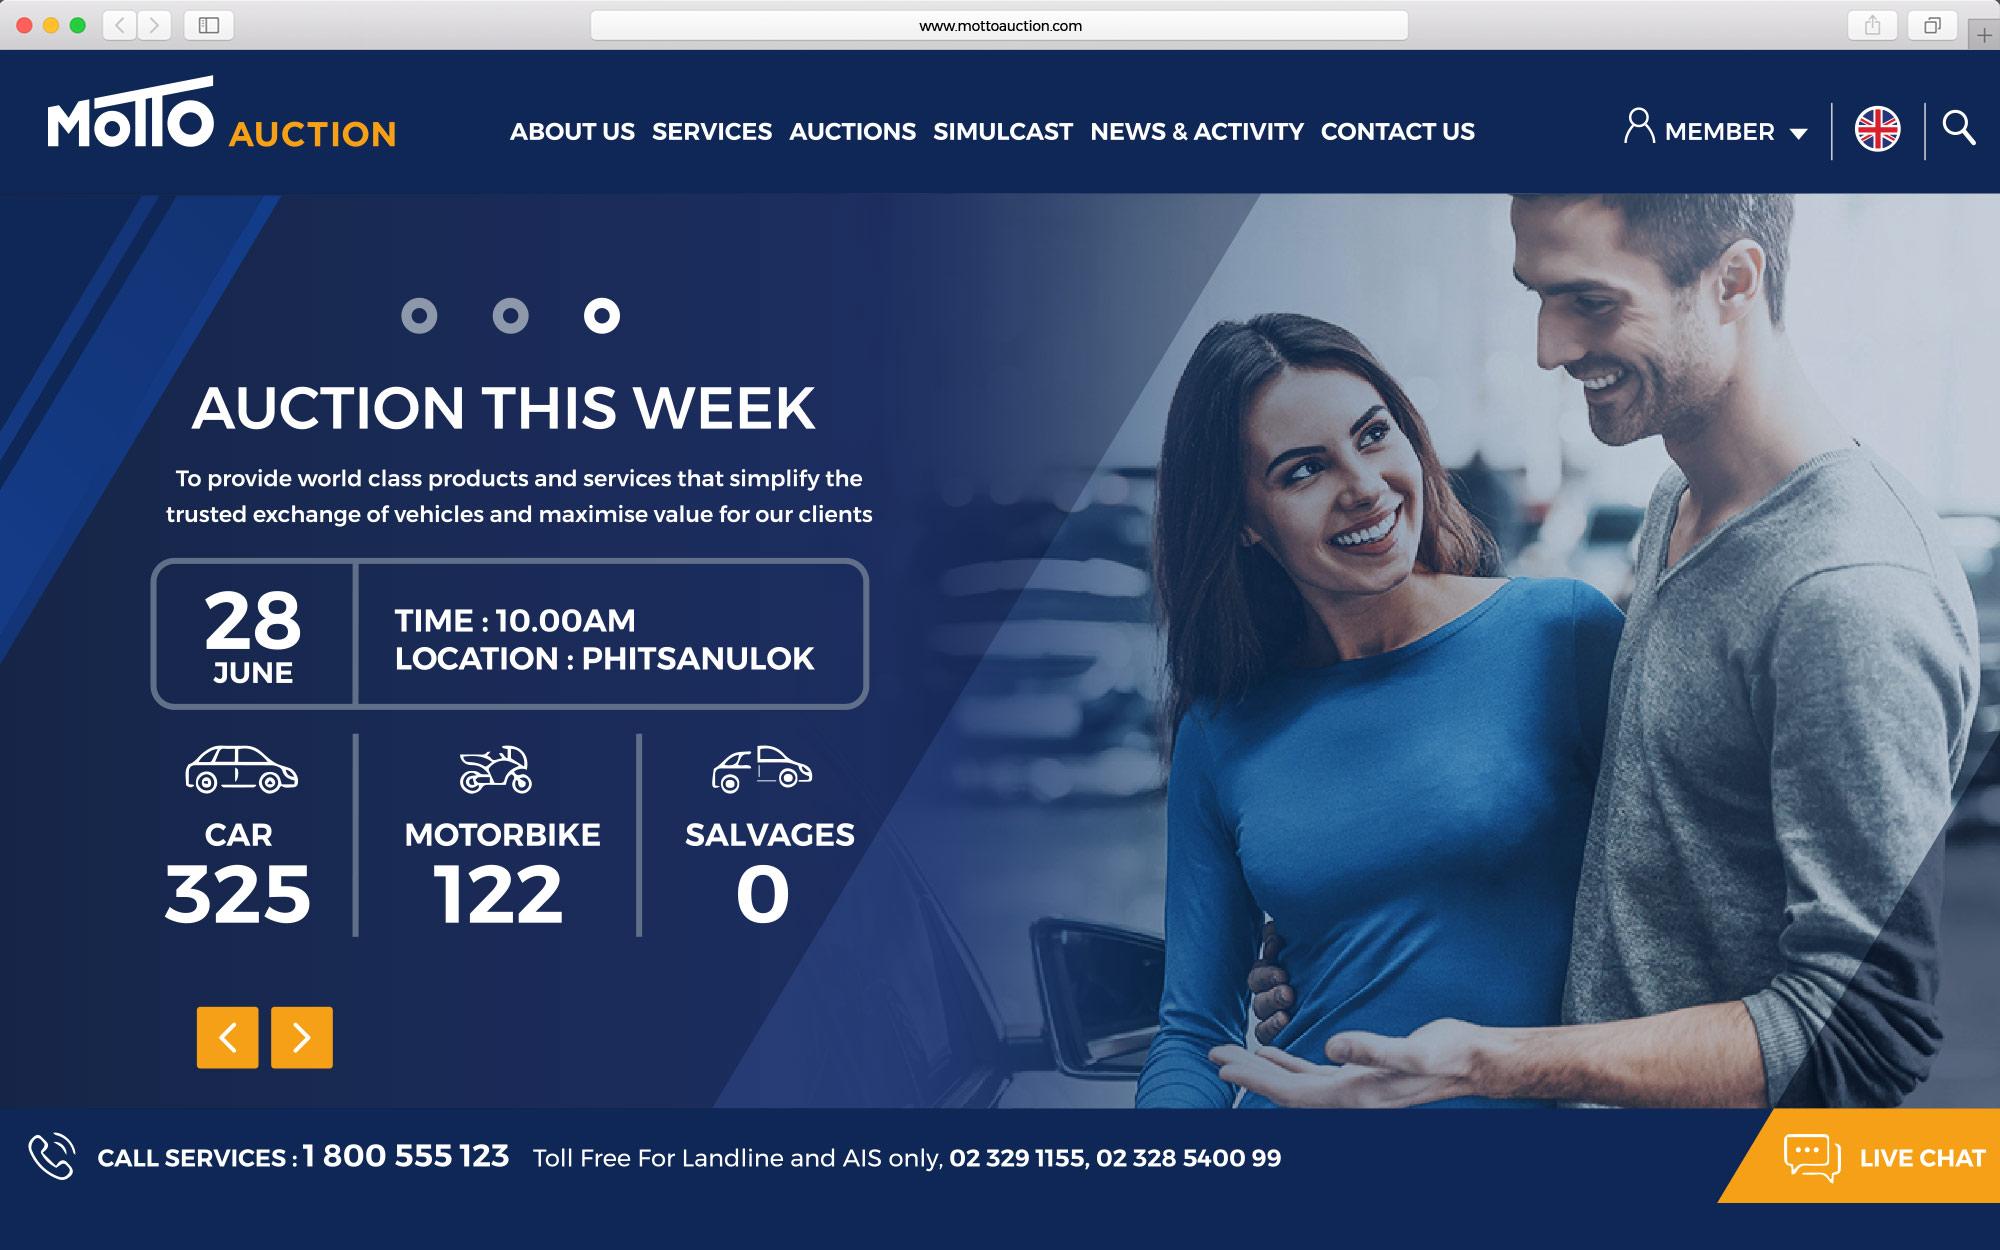 Motto Auction Website Design